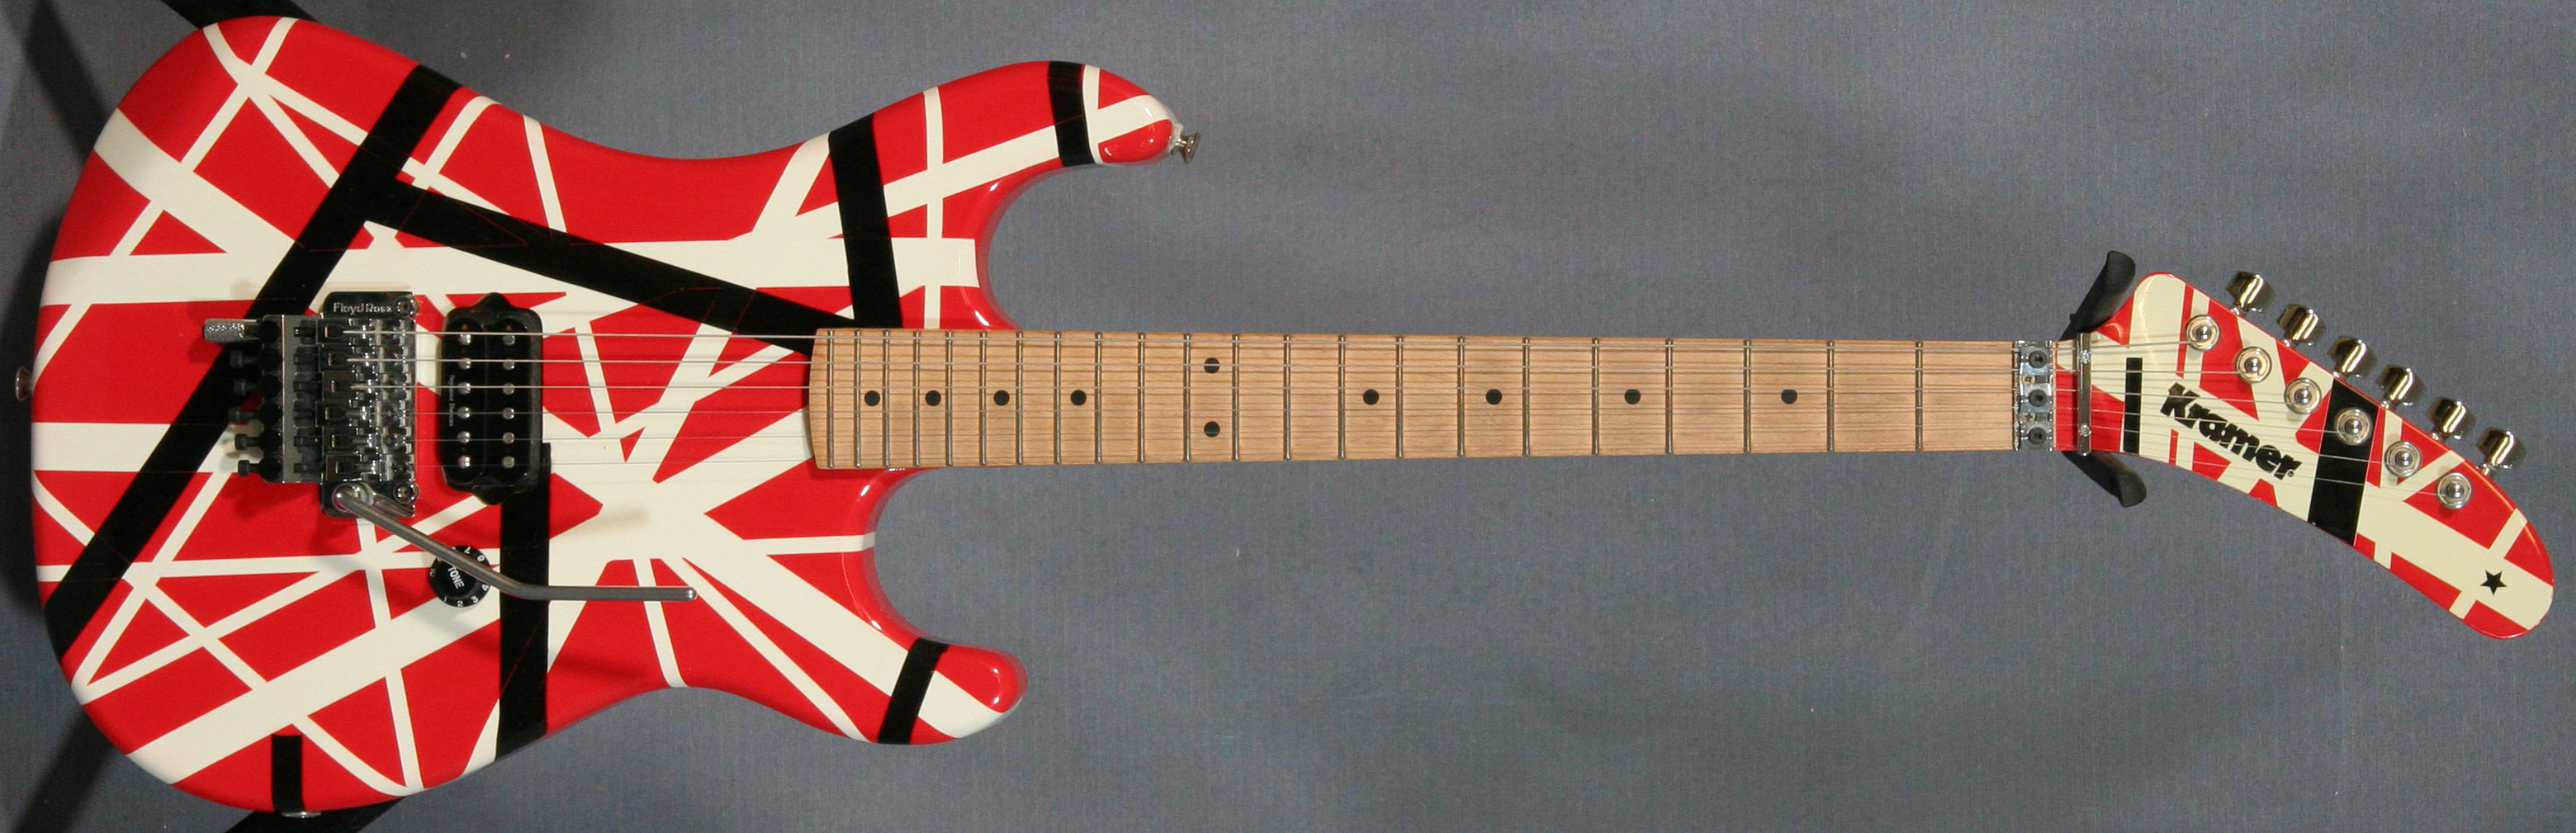 Artist Guitars Artistic Guitars